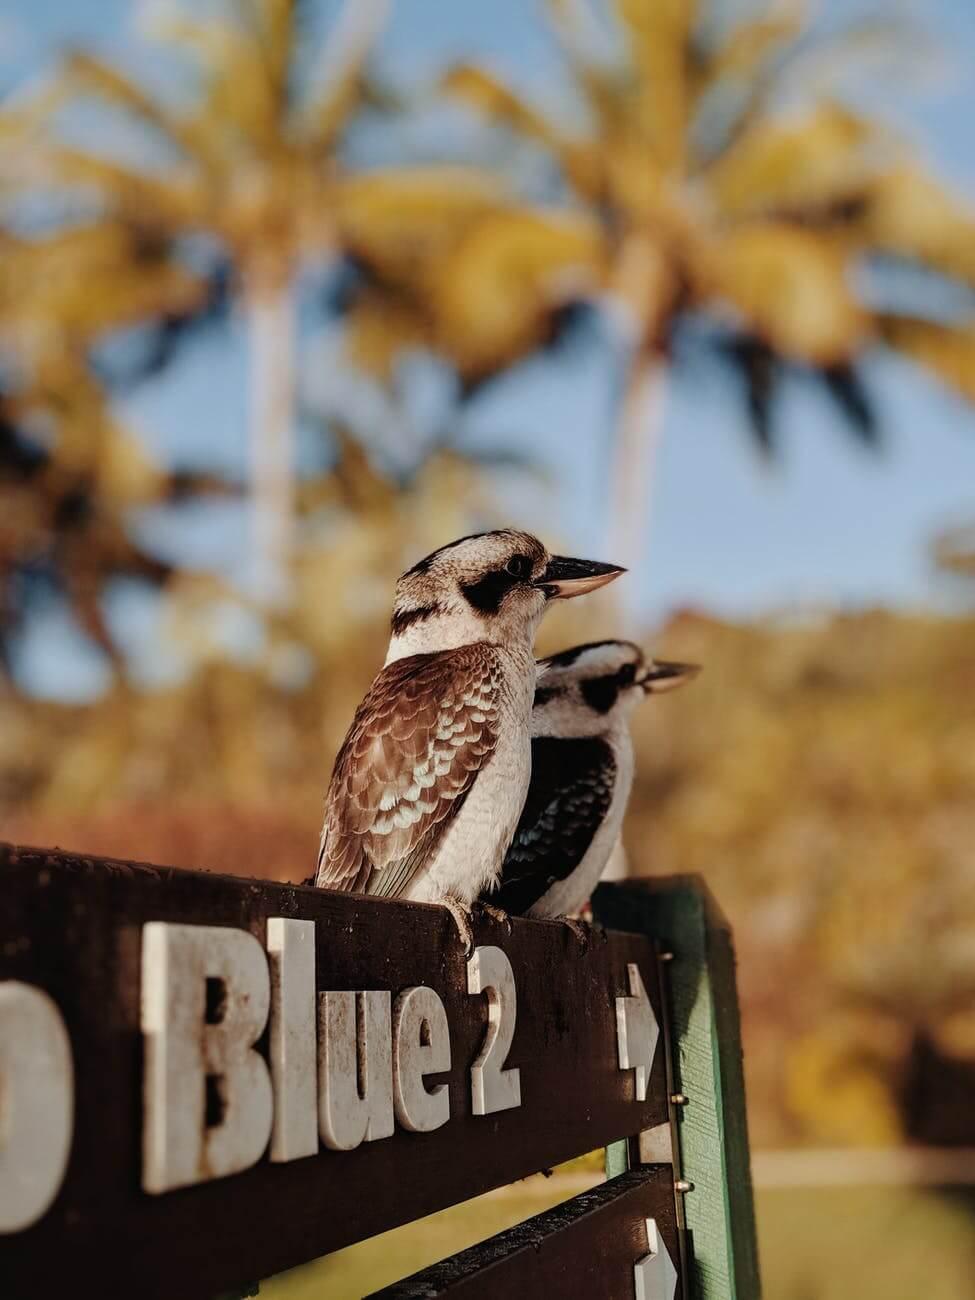 Bird Board Games (4+1 bonus) in case you are fond of birds